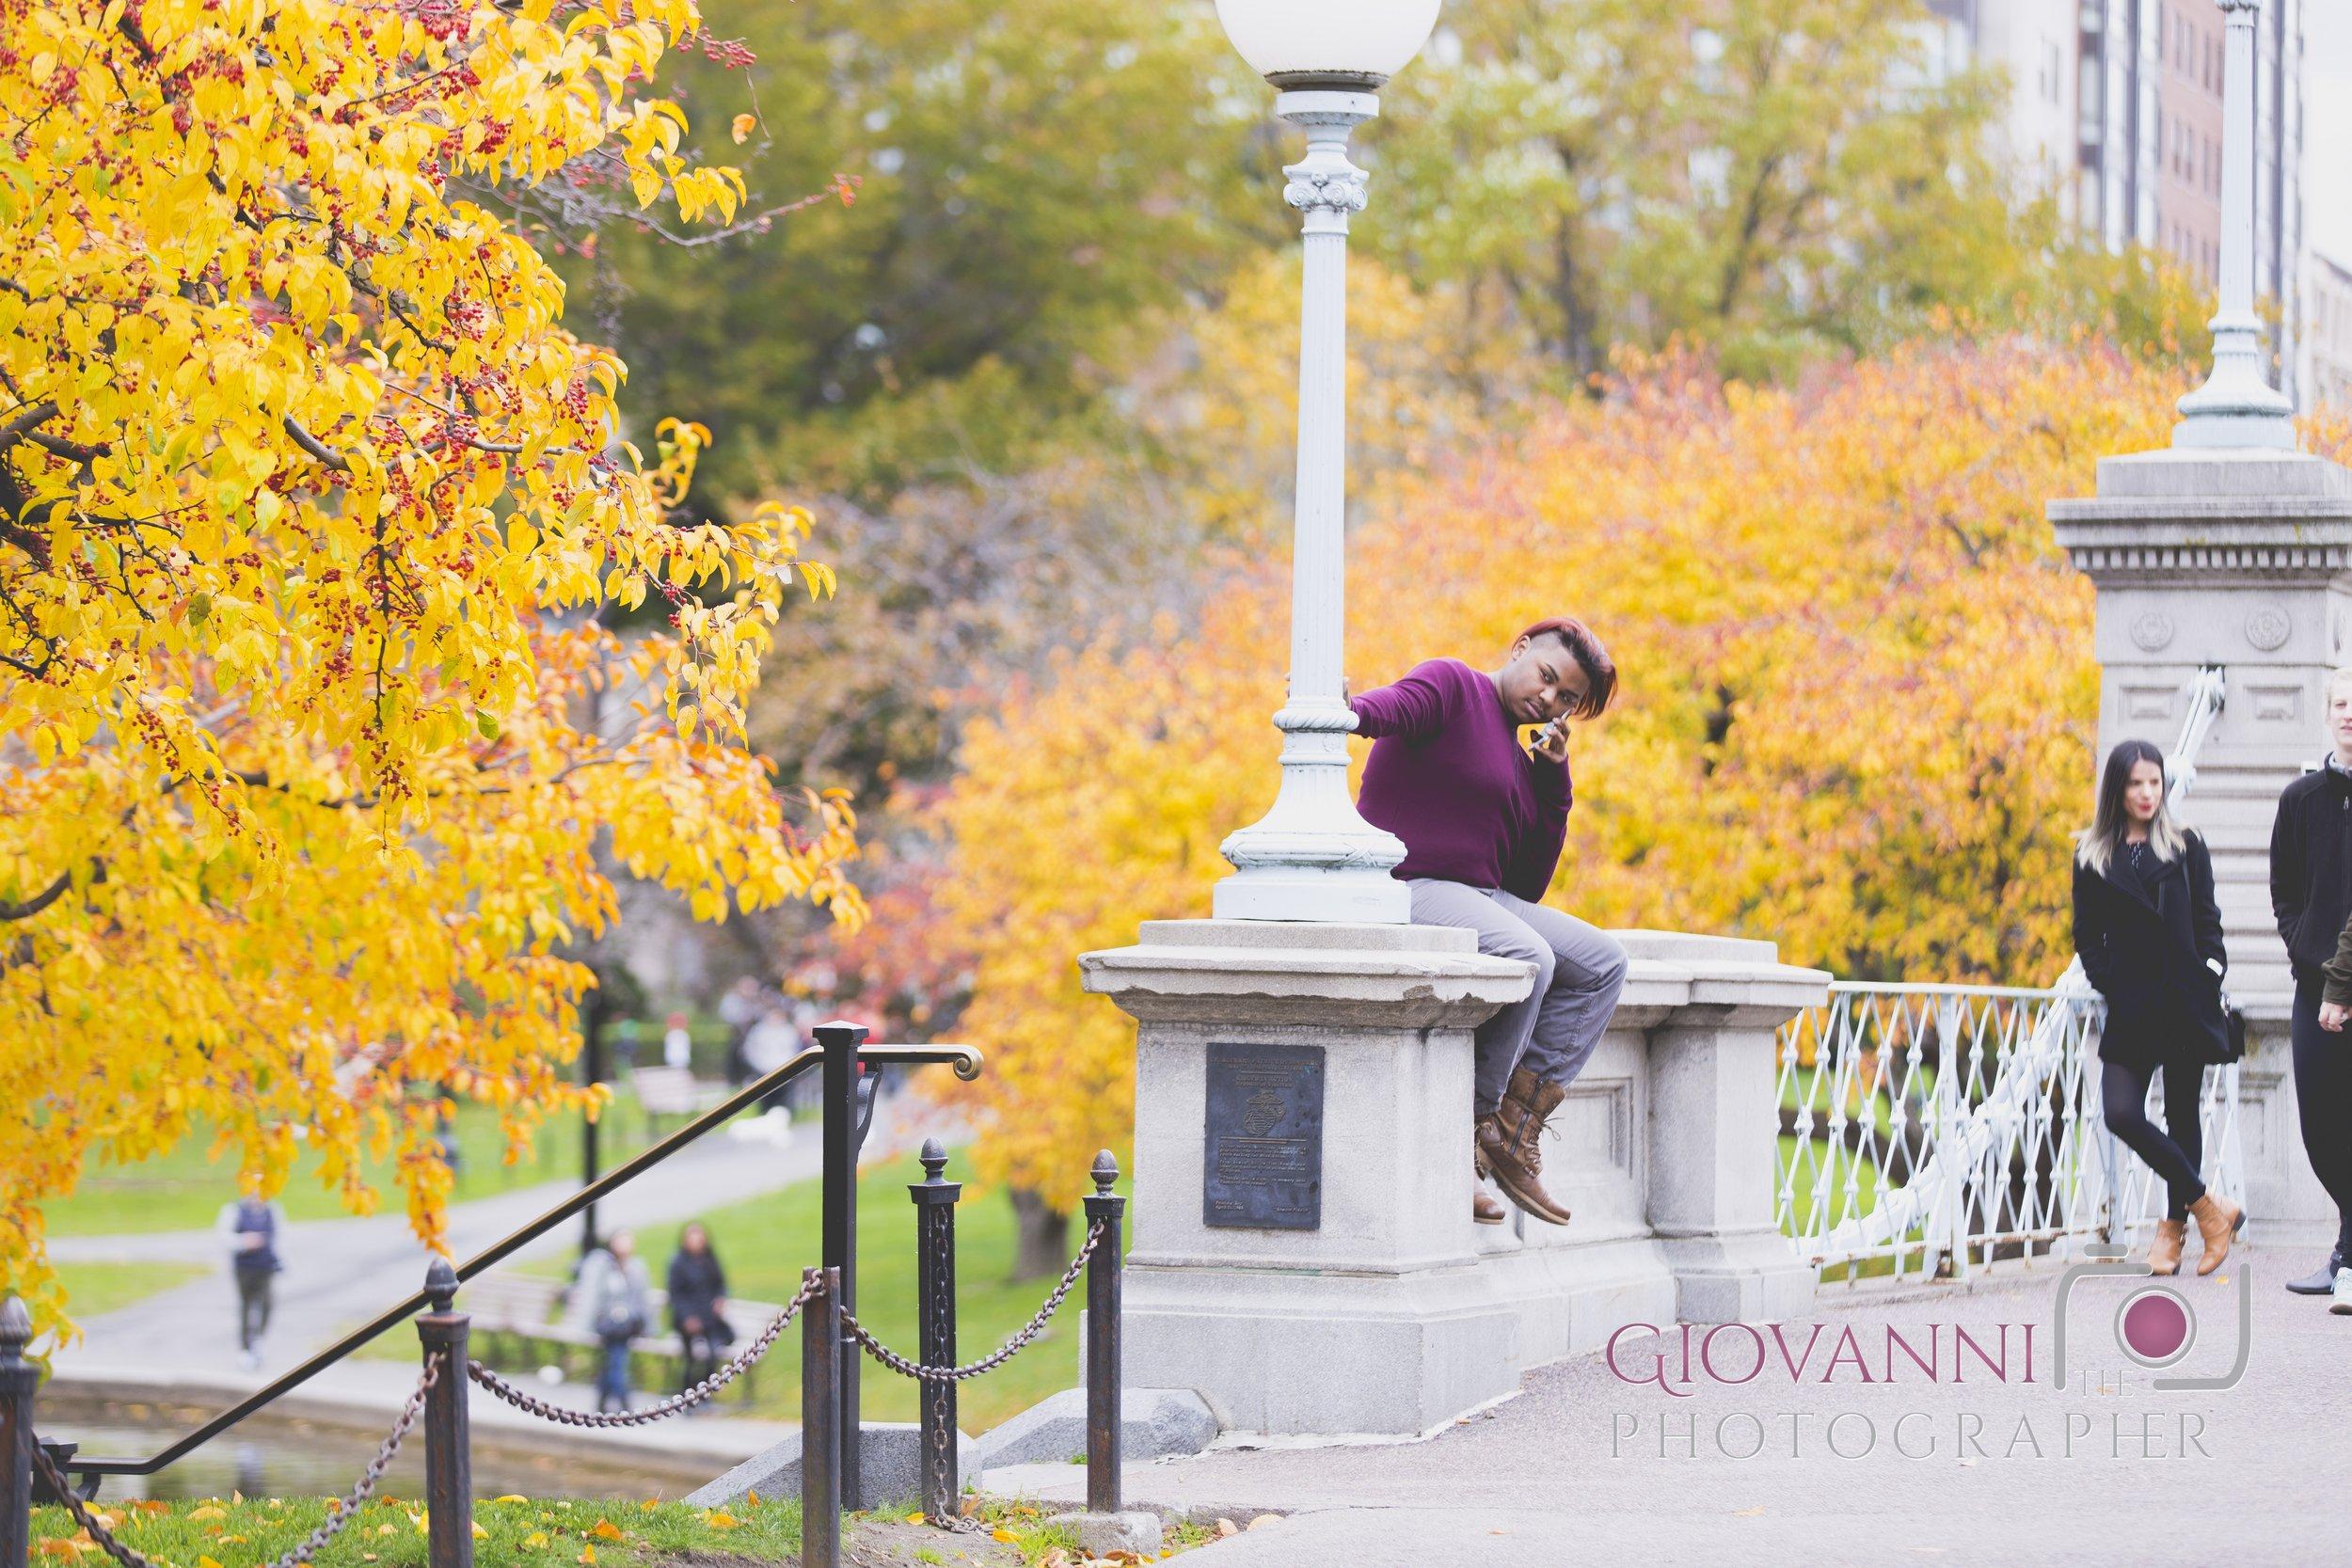 8C2A7116GiovanniThePhotographerMatte.jpg